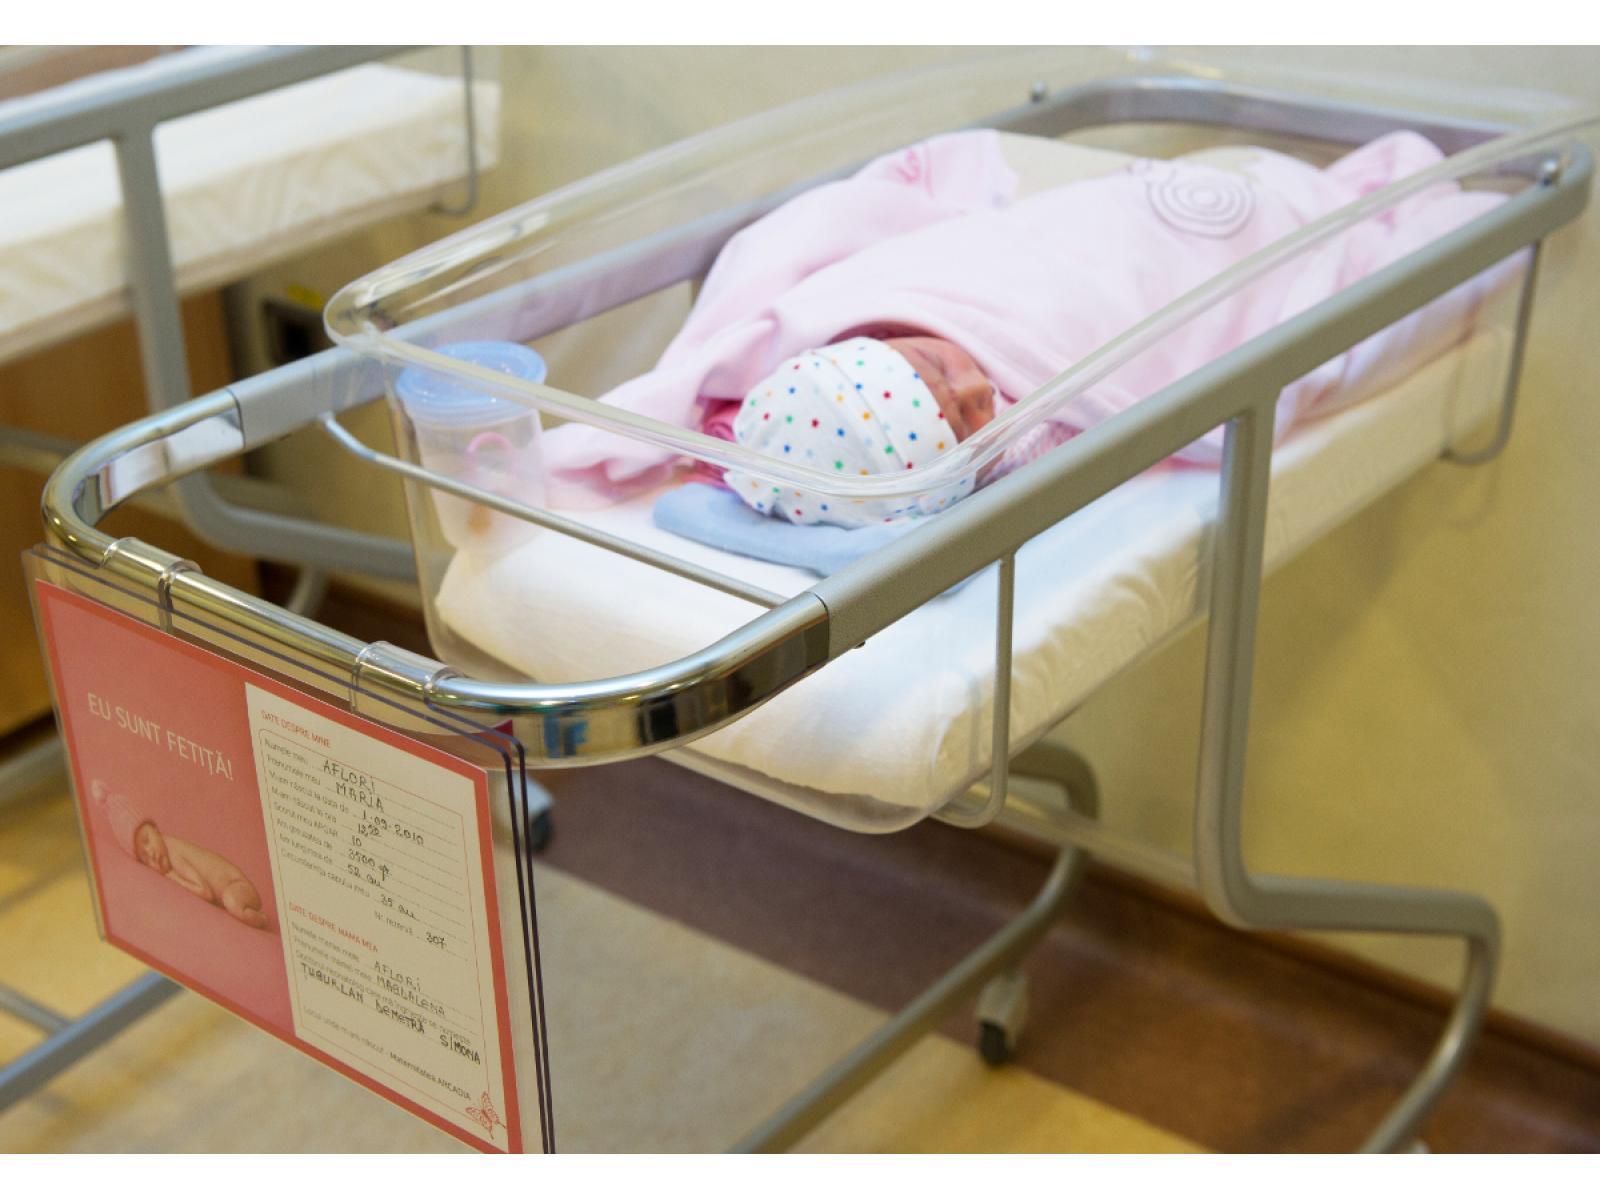 Arcadia Spitale si Centre Medicale - NGM_5634.jpg